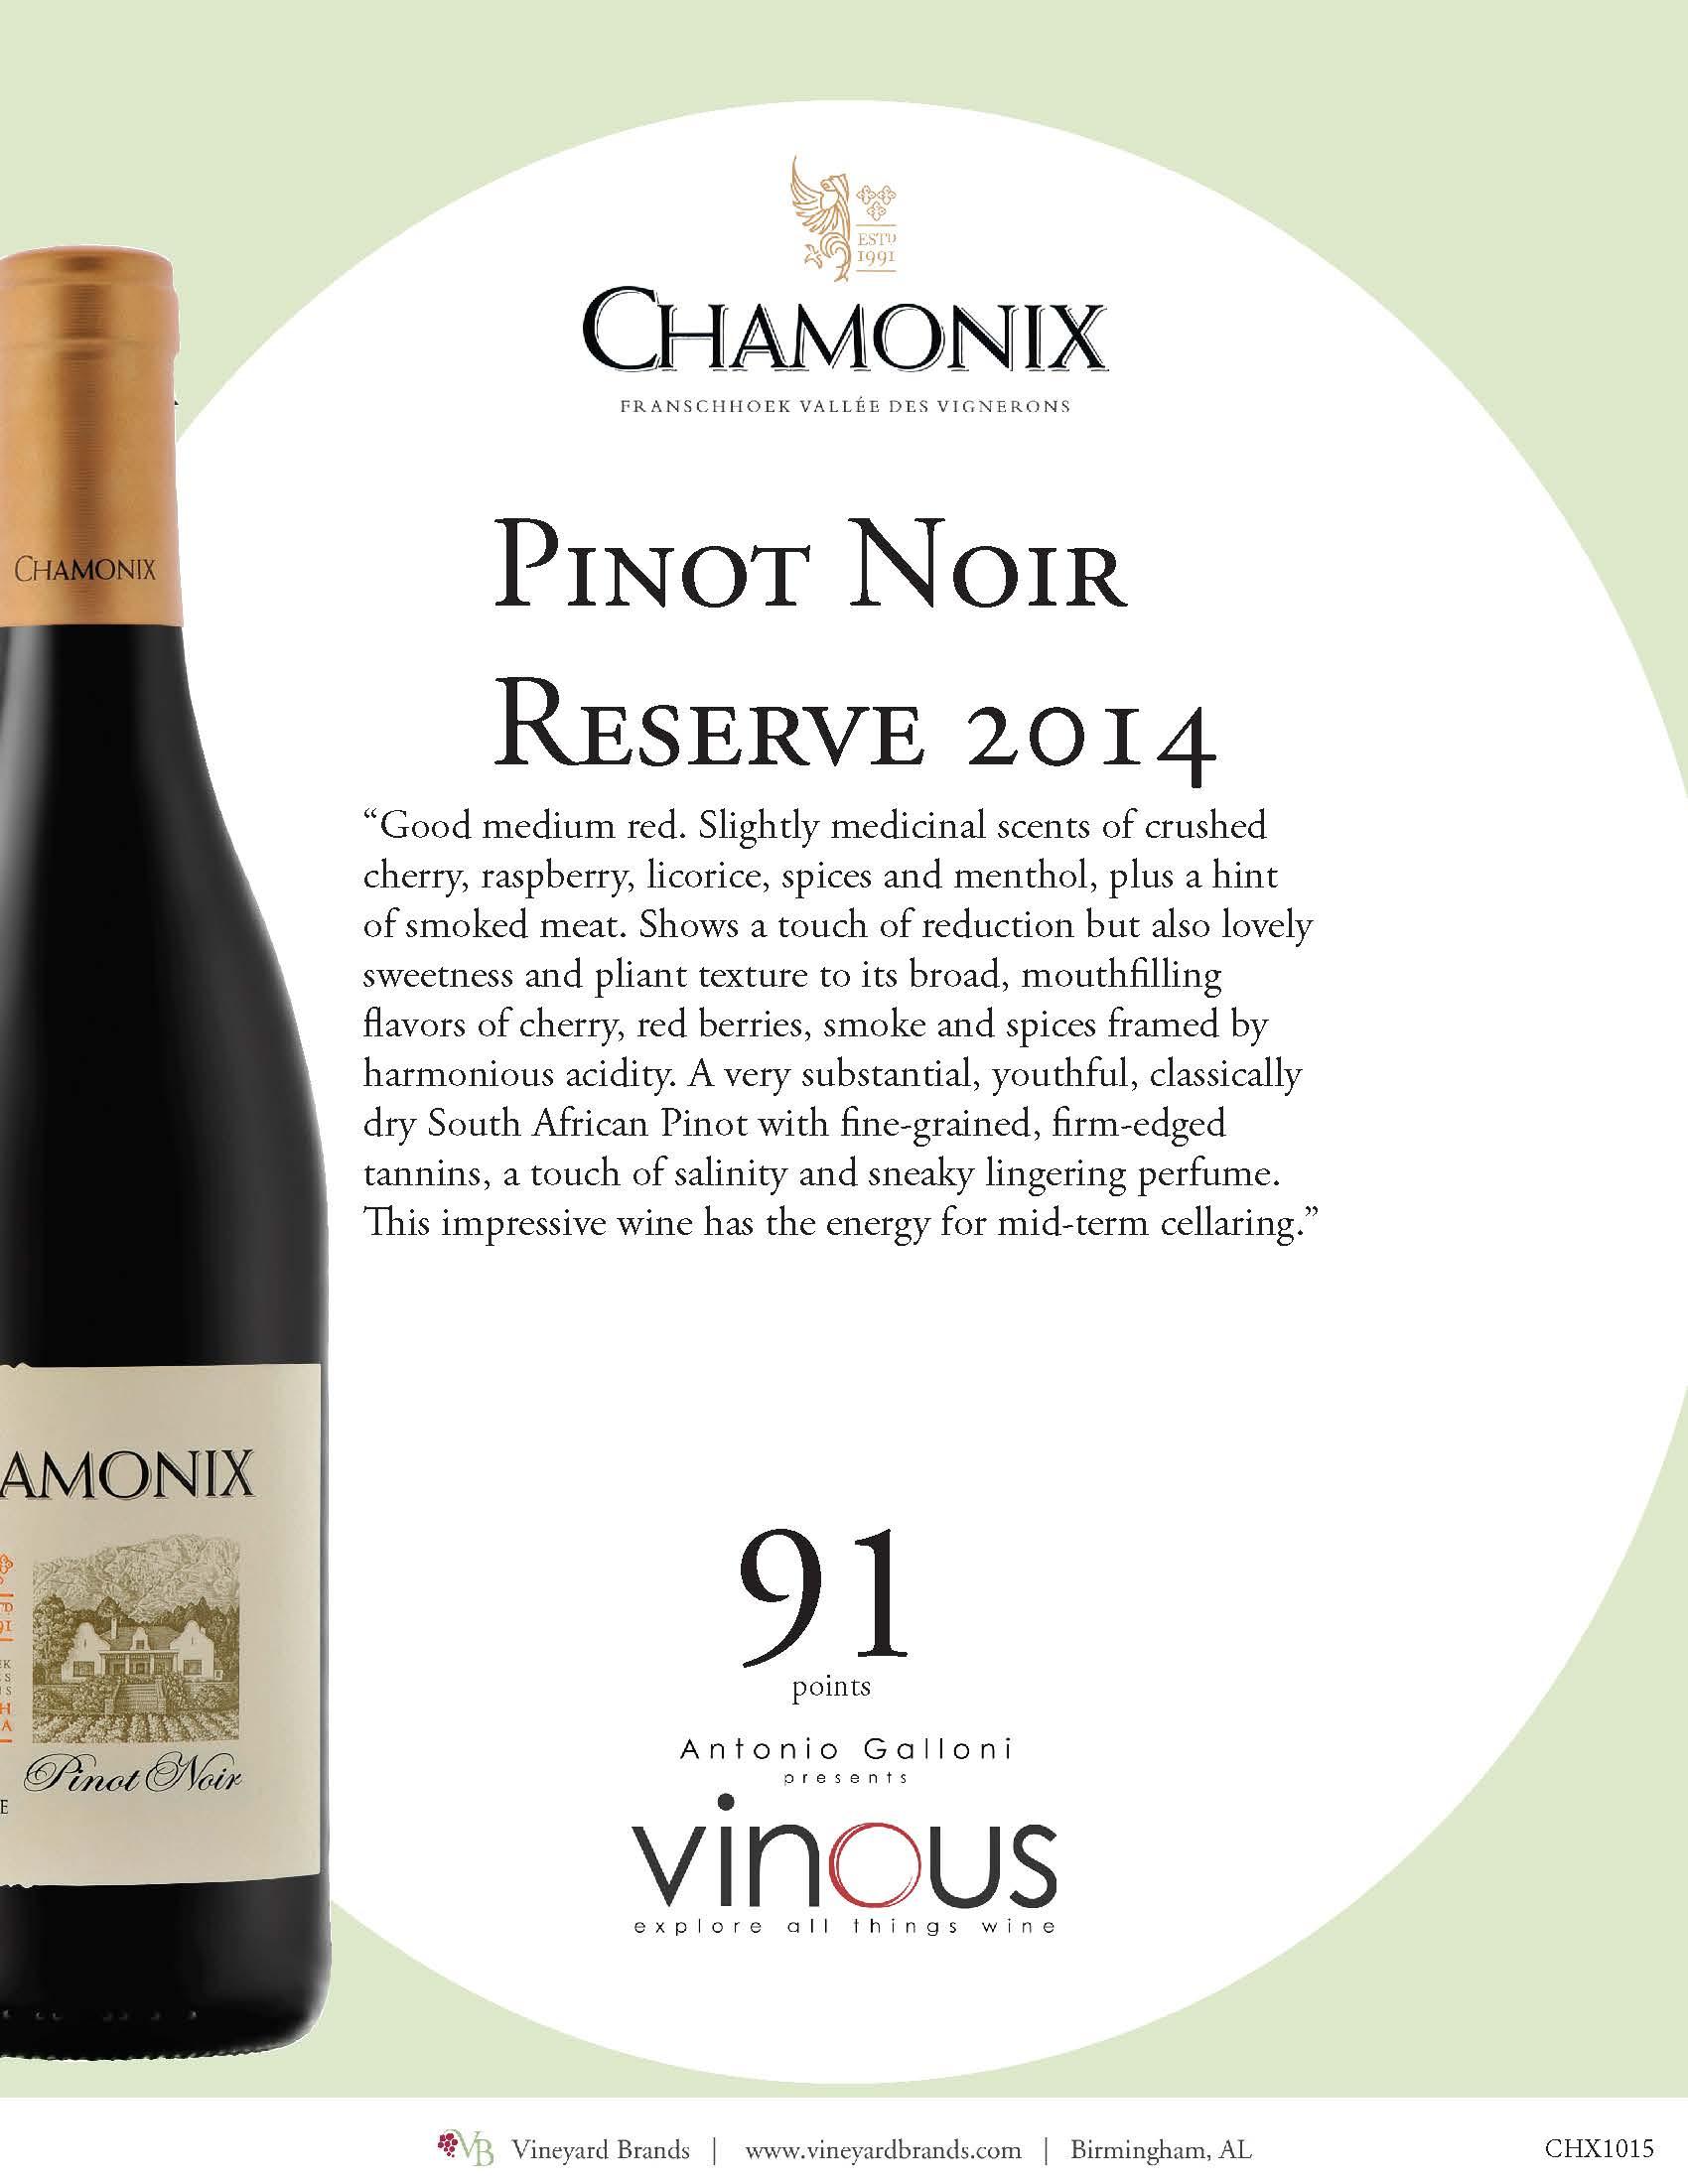 ChamonixPinotNoirReserve2014.jpg